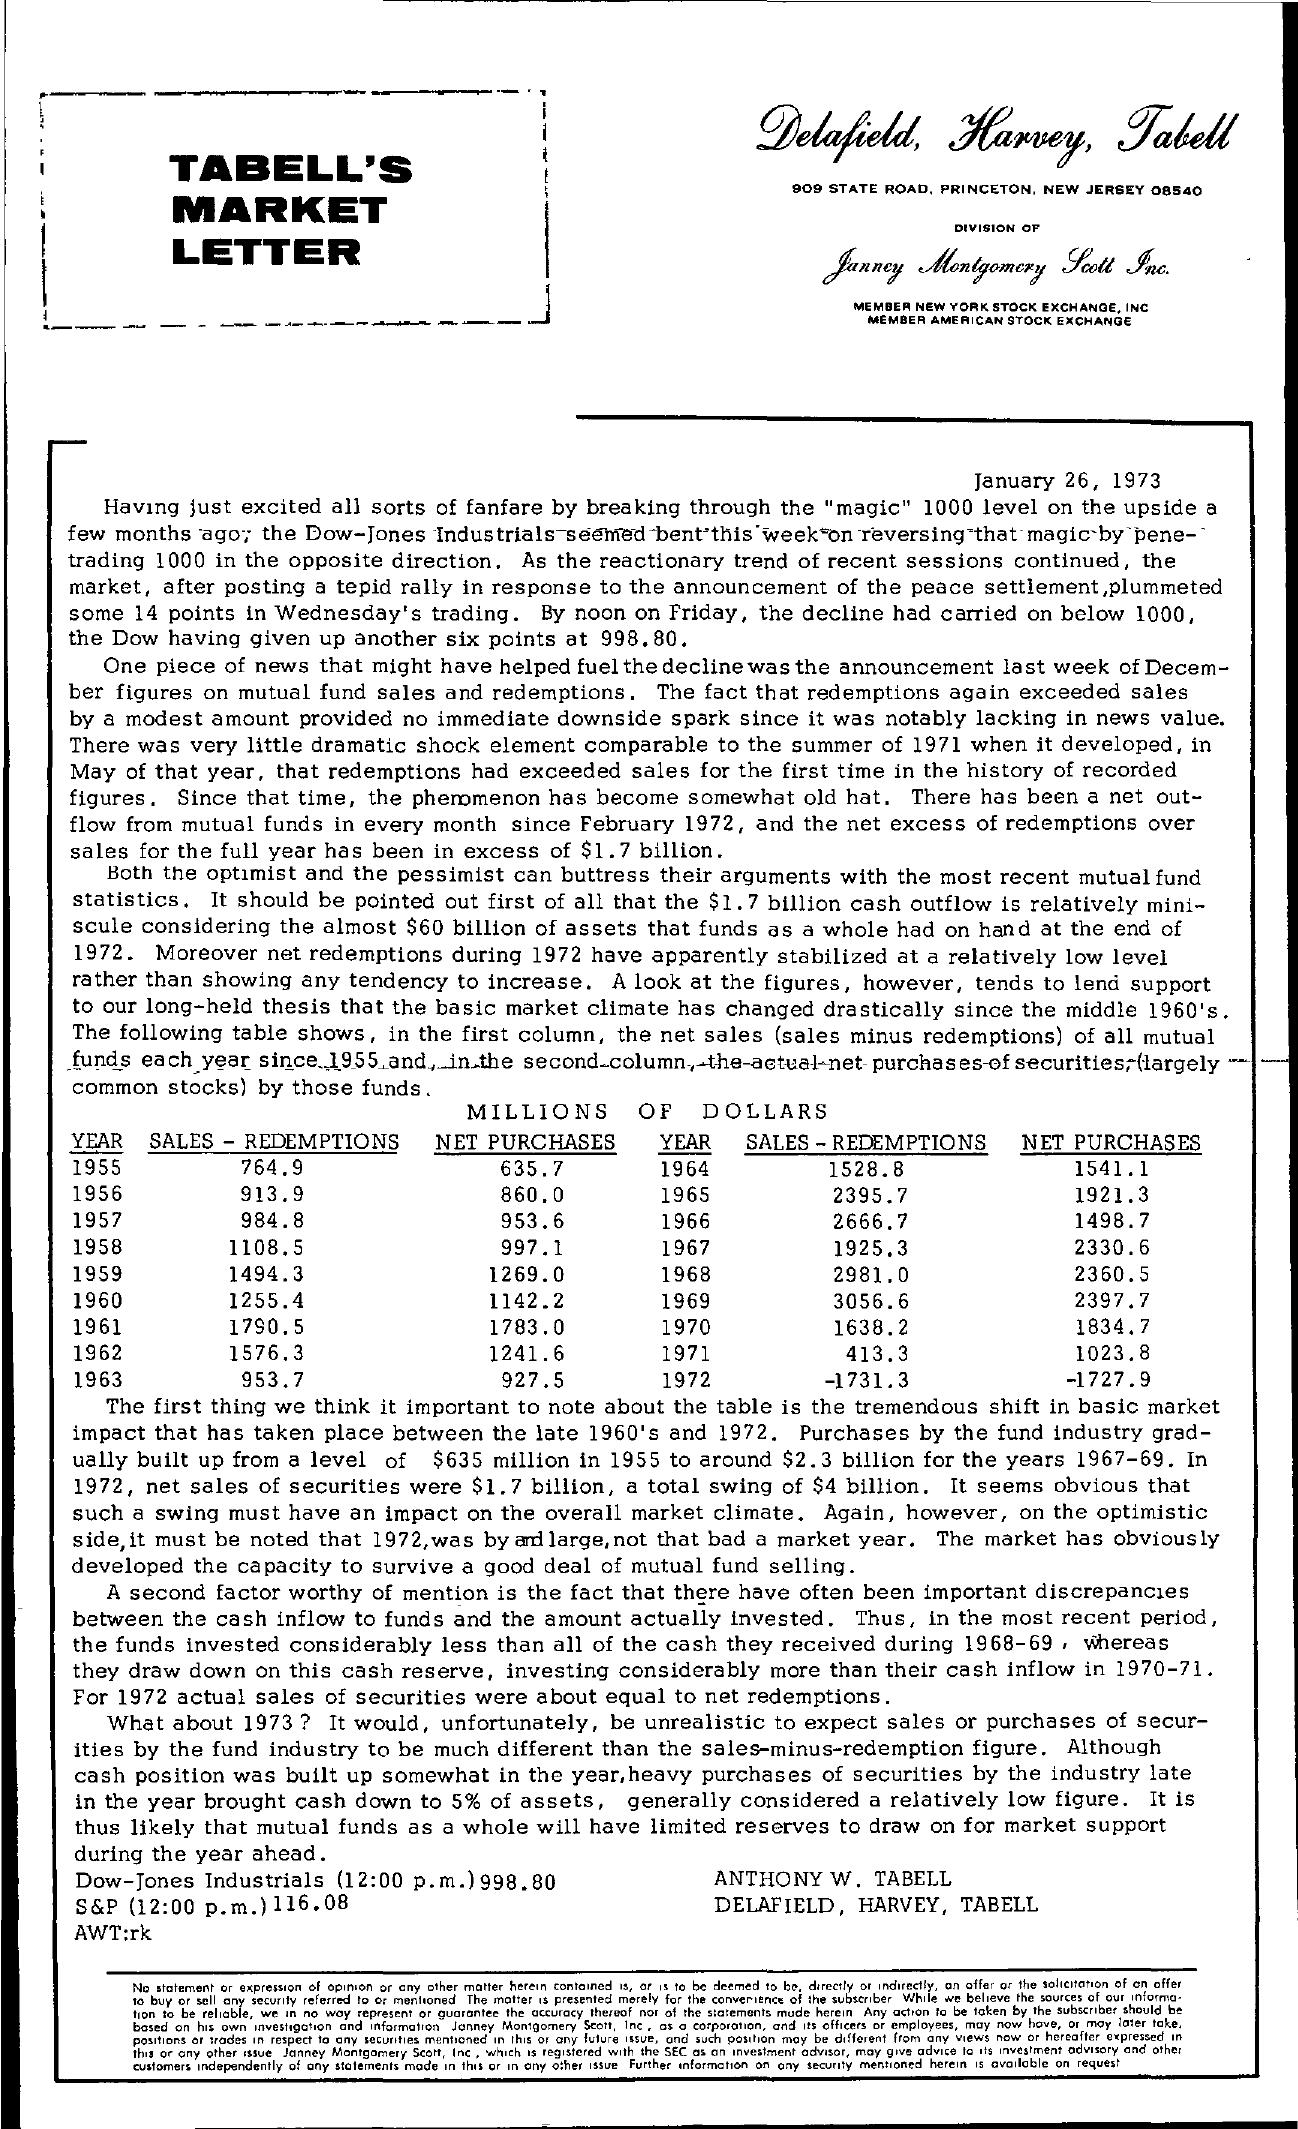 Tabell's Market Letter - January 26, 1973